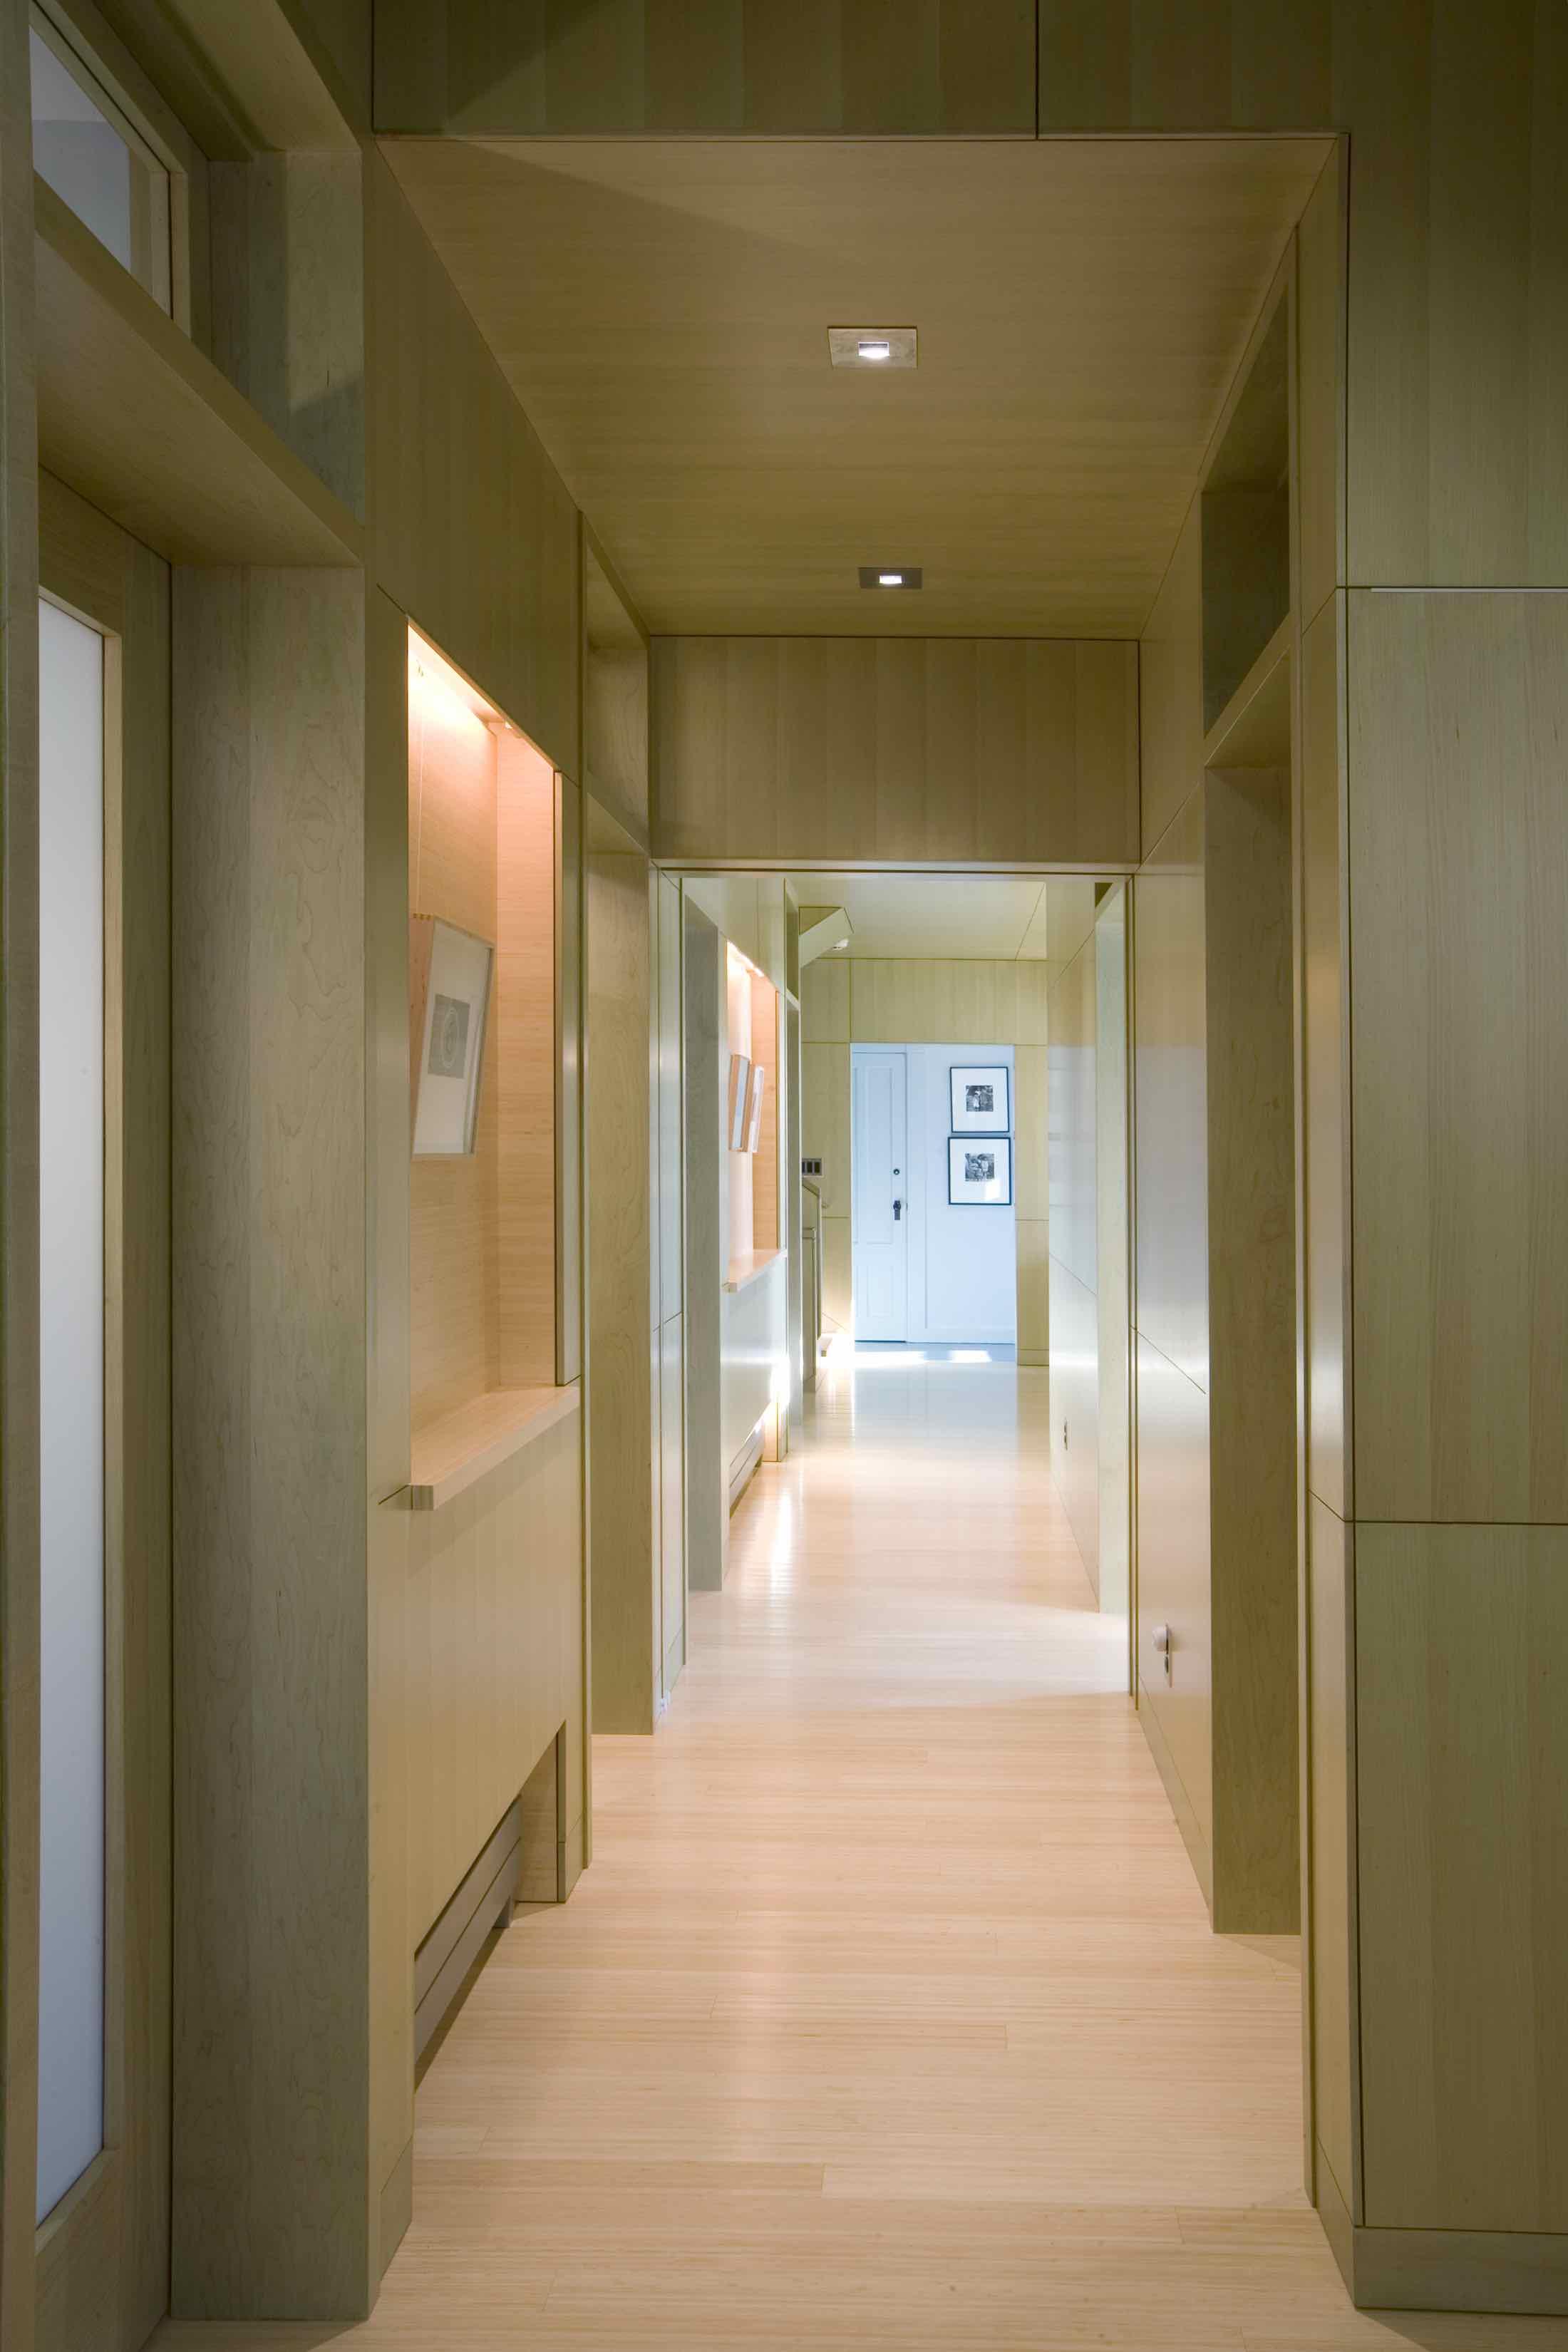 10 AVISNQ_MH_PV_INT_17 harpoon hallway.jpg